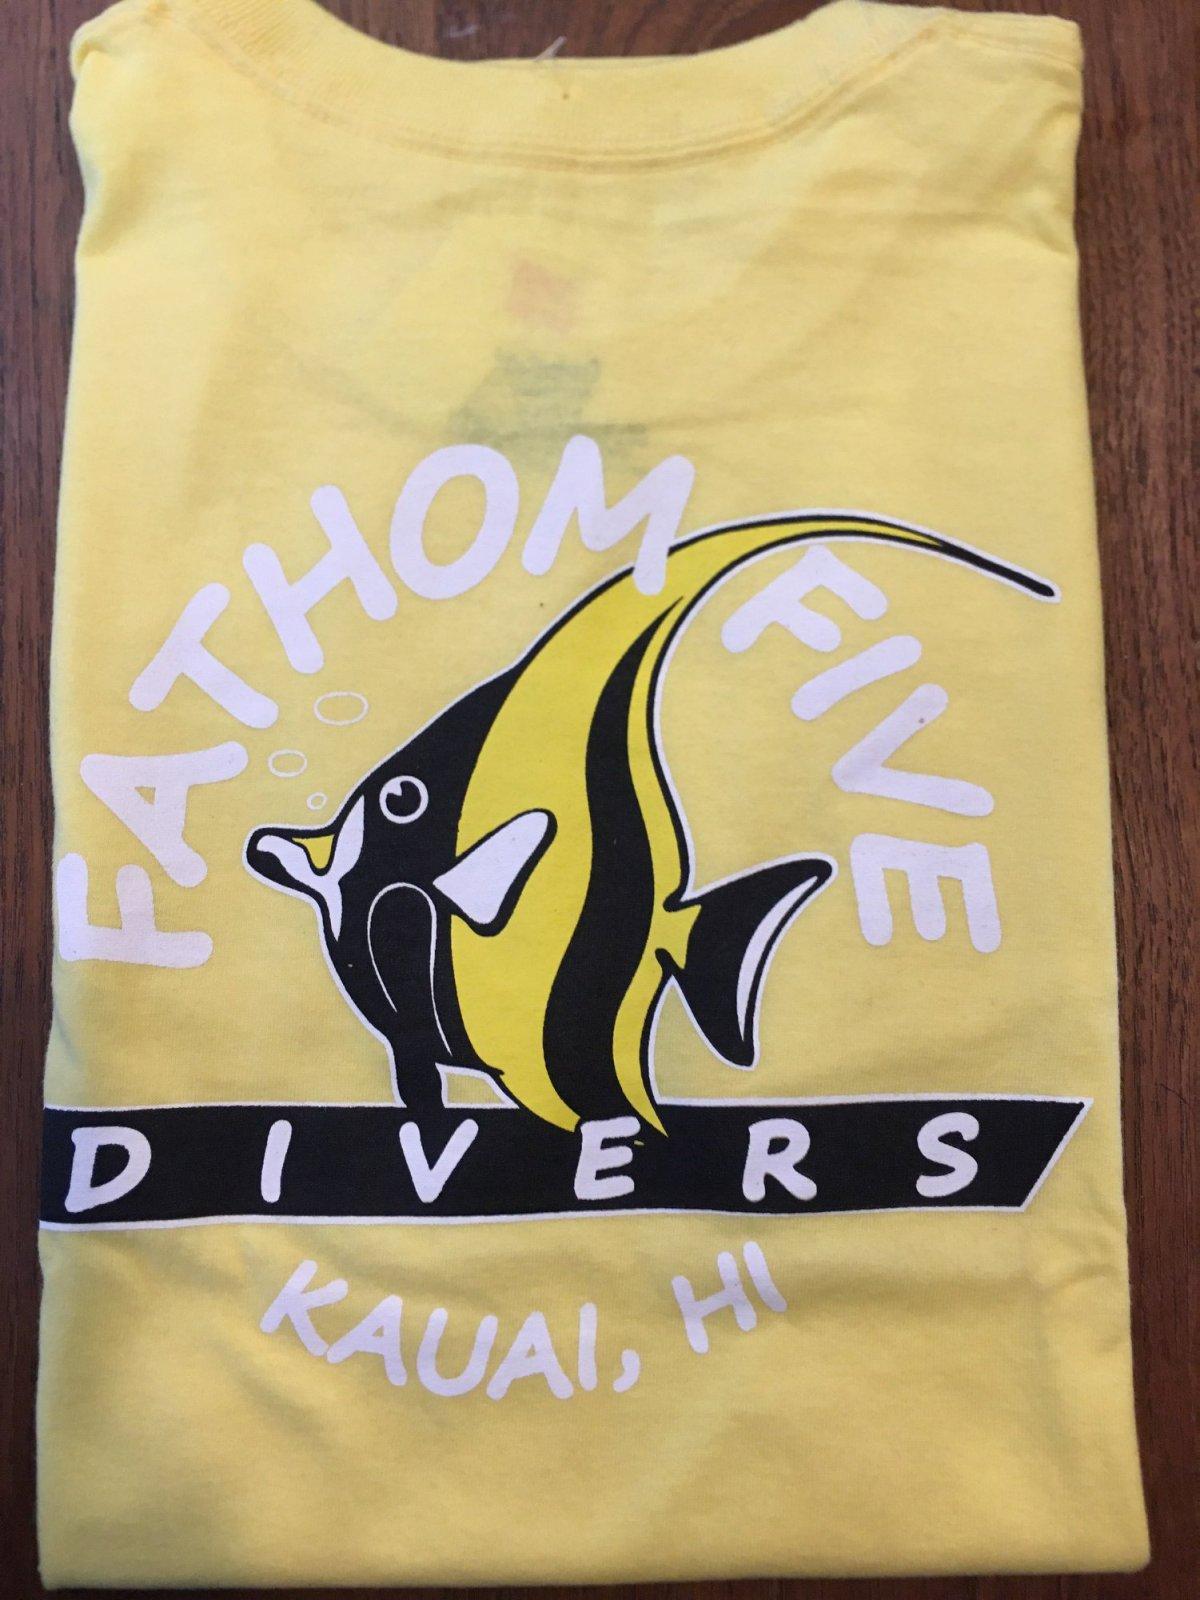 Fathom5 Logo Tee, Yellow